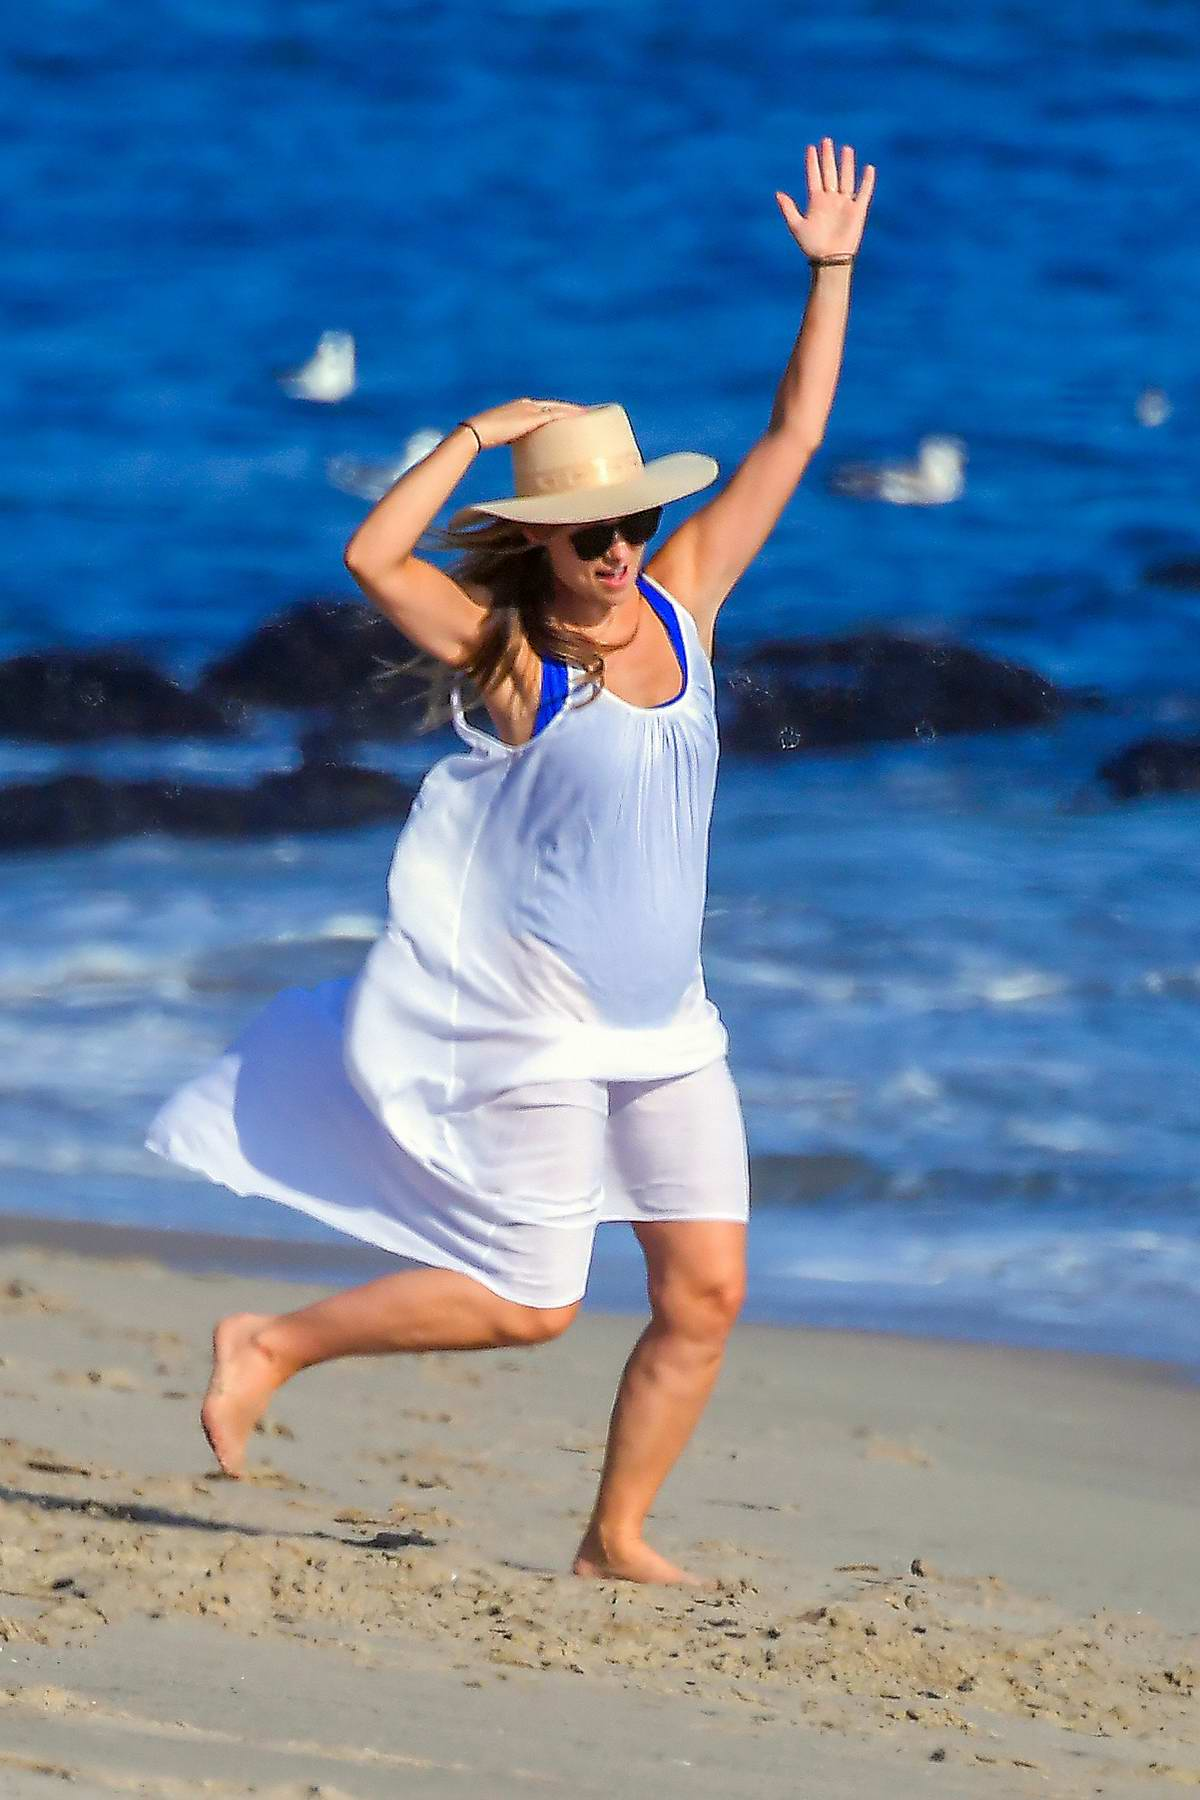 Olivia Wilde seen wearing a white cover-up dress while enjoying a beach day in Santa Monica, California